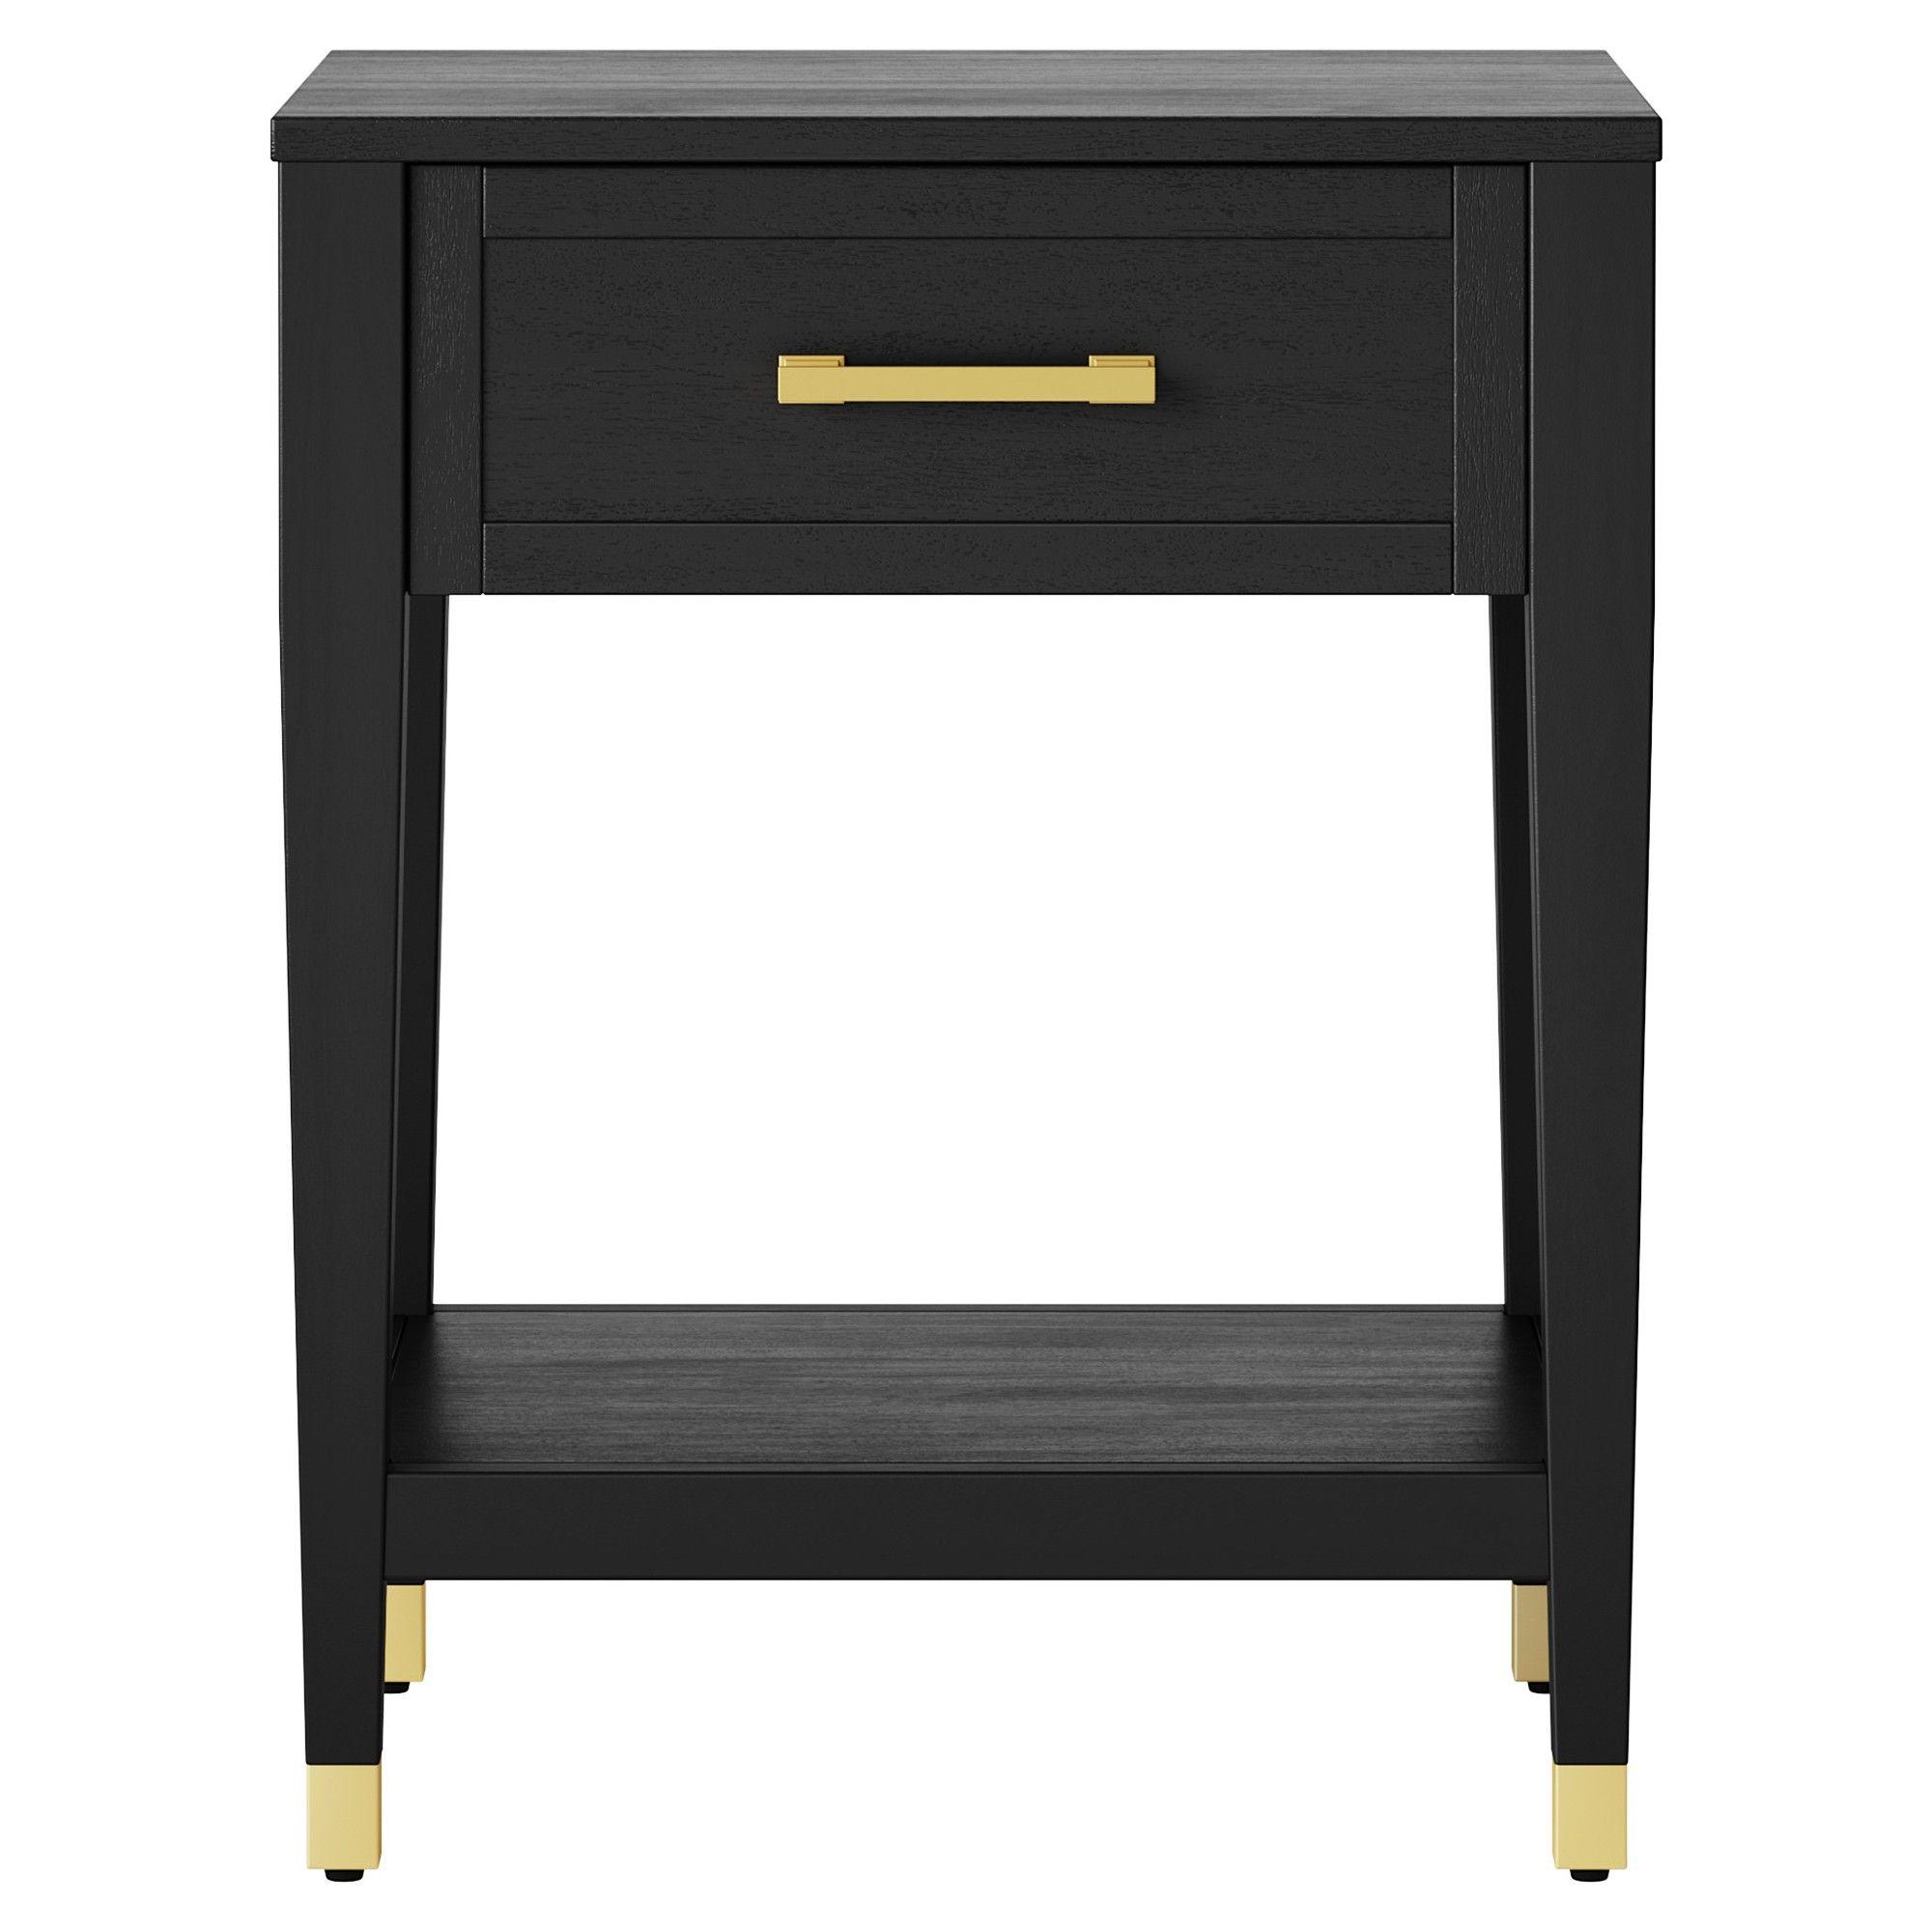 Duxbury Black End Table With Gold Feet Threshold Black End